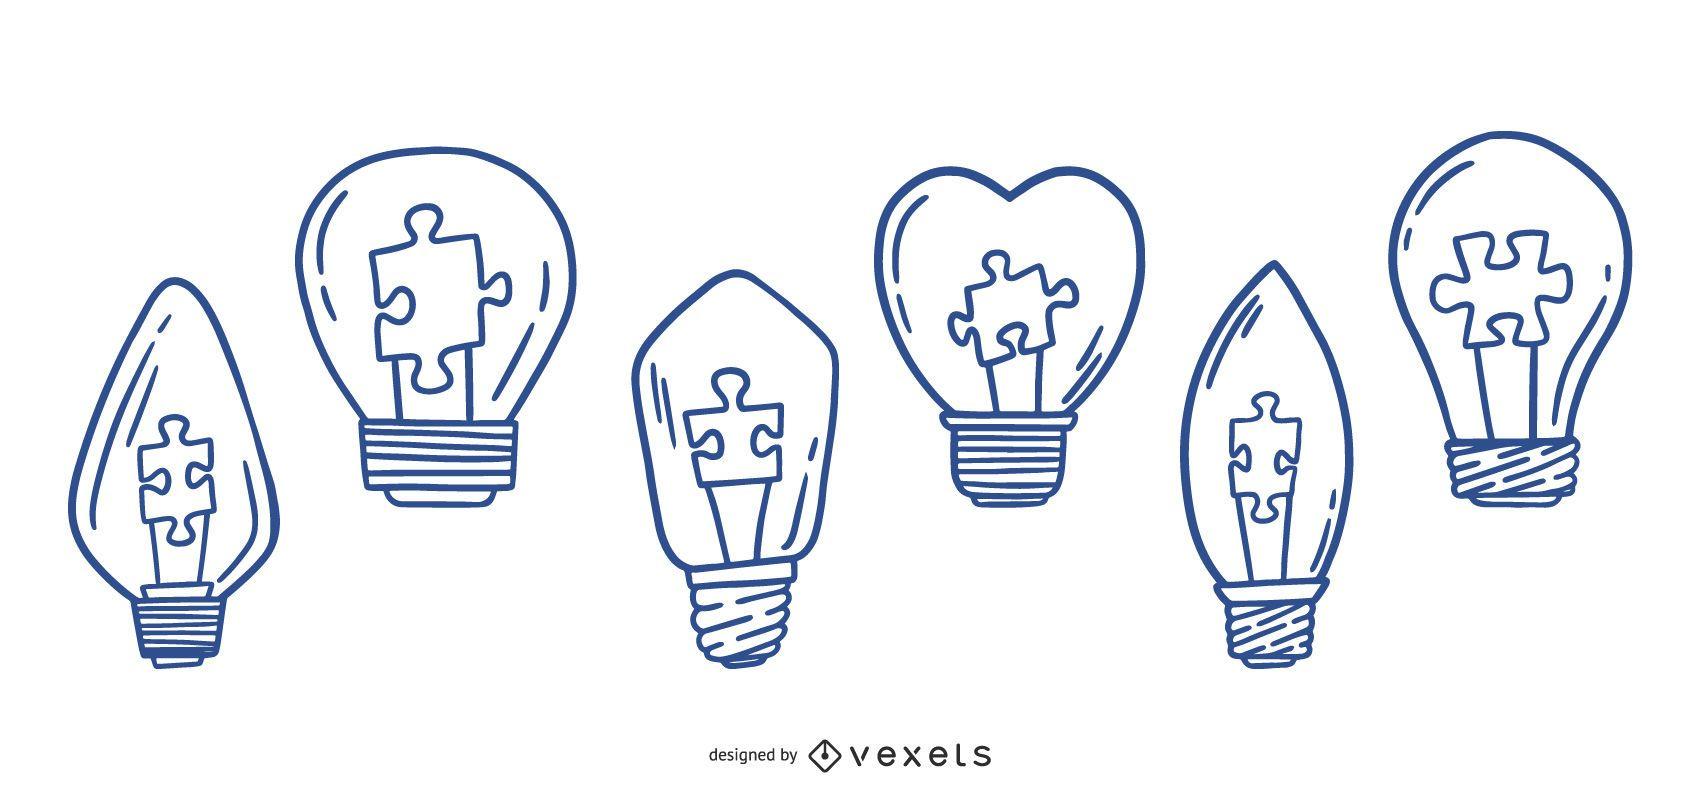 Stroke Autism Light Bulb Design Pack